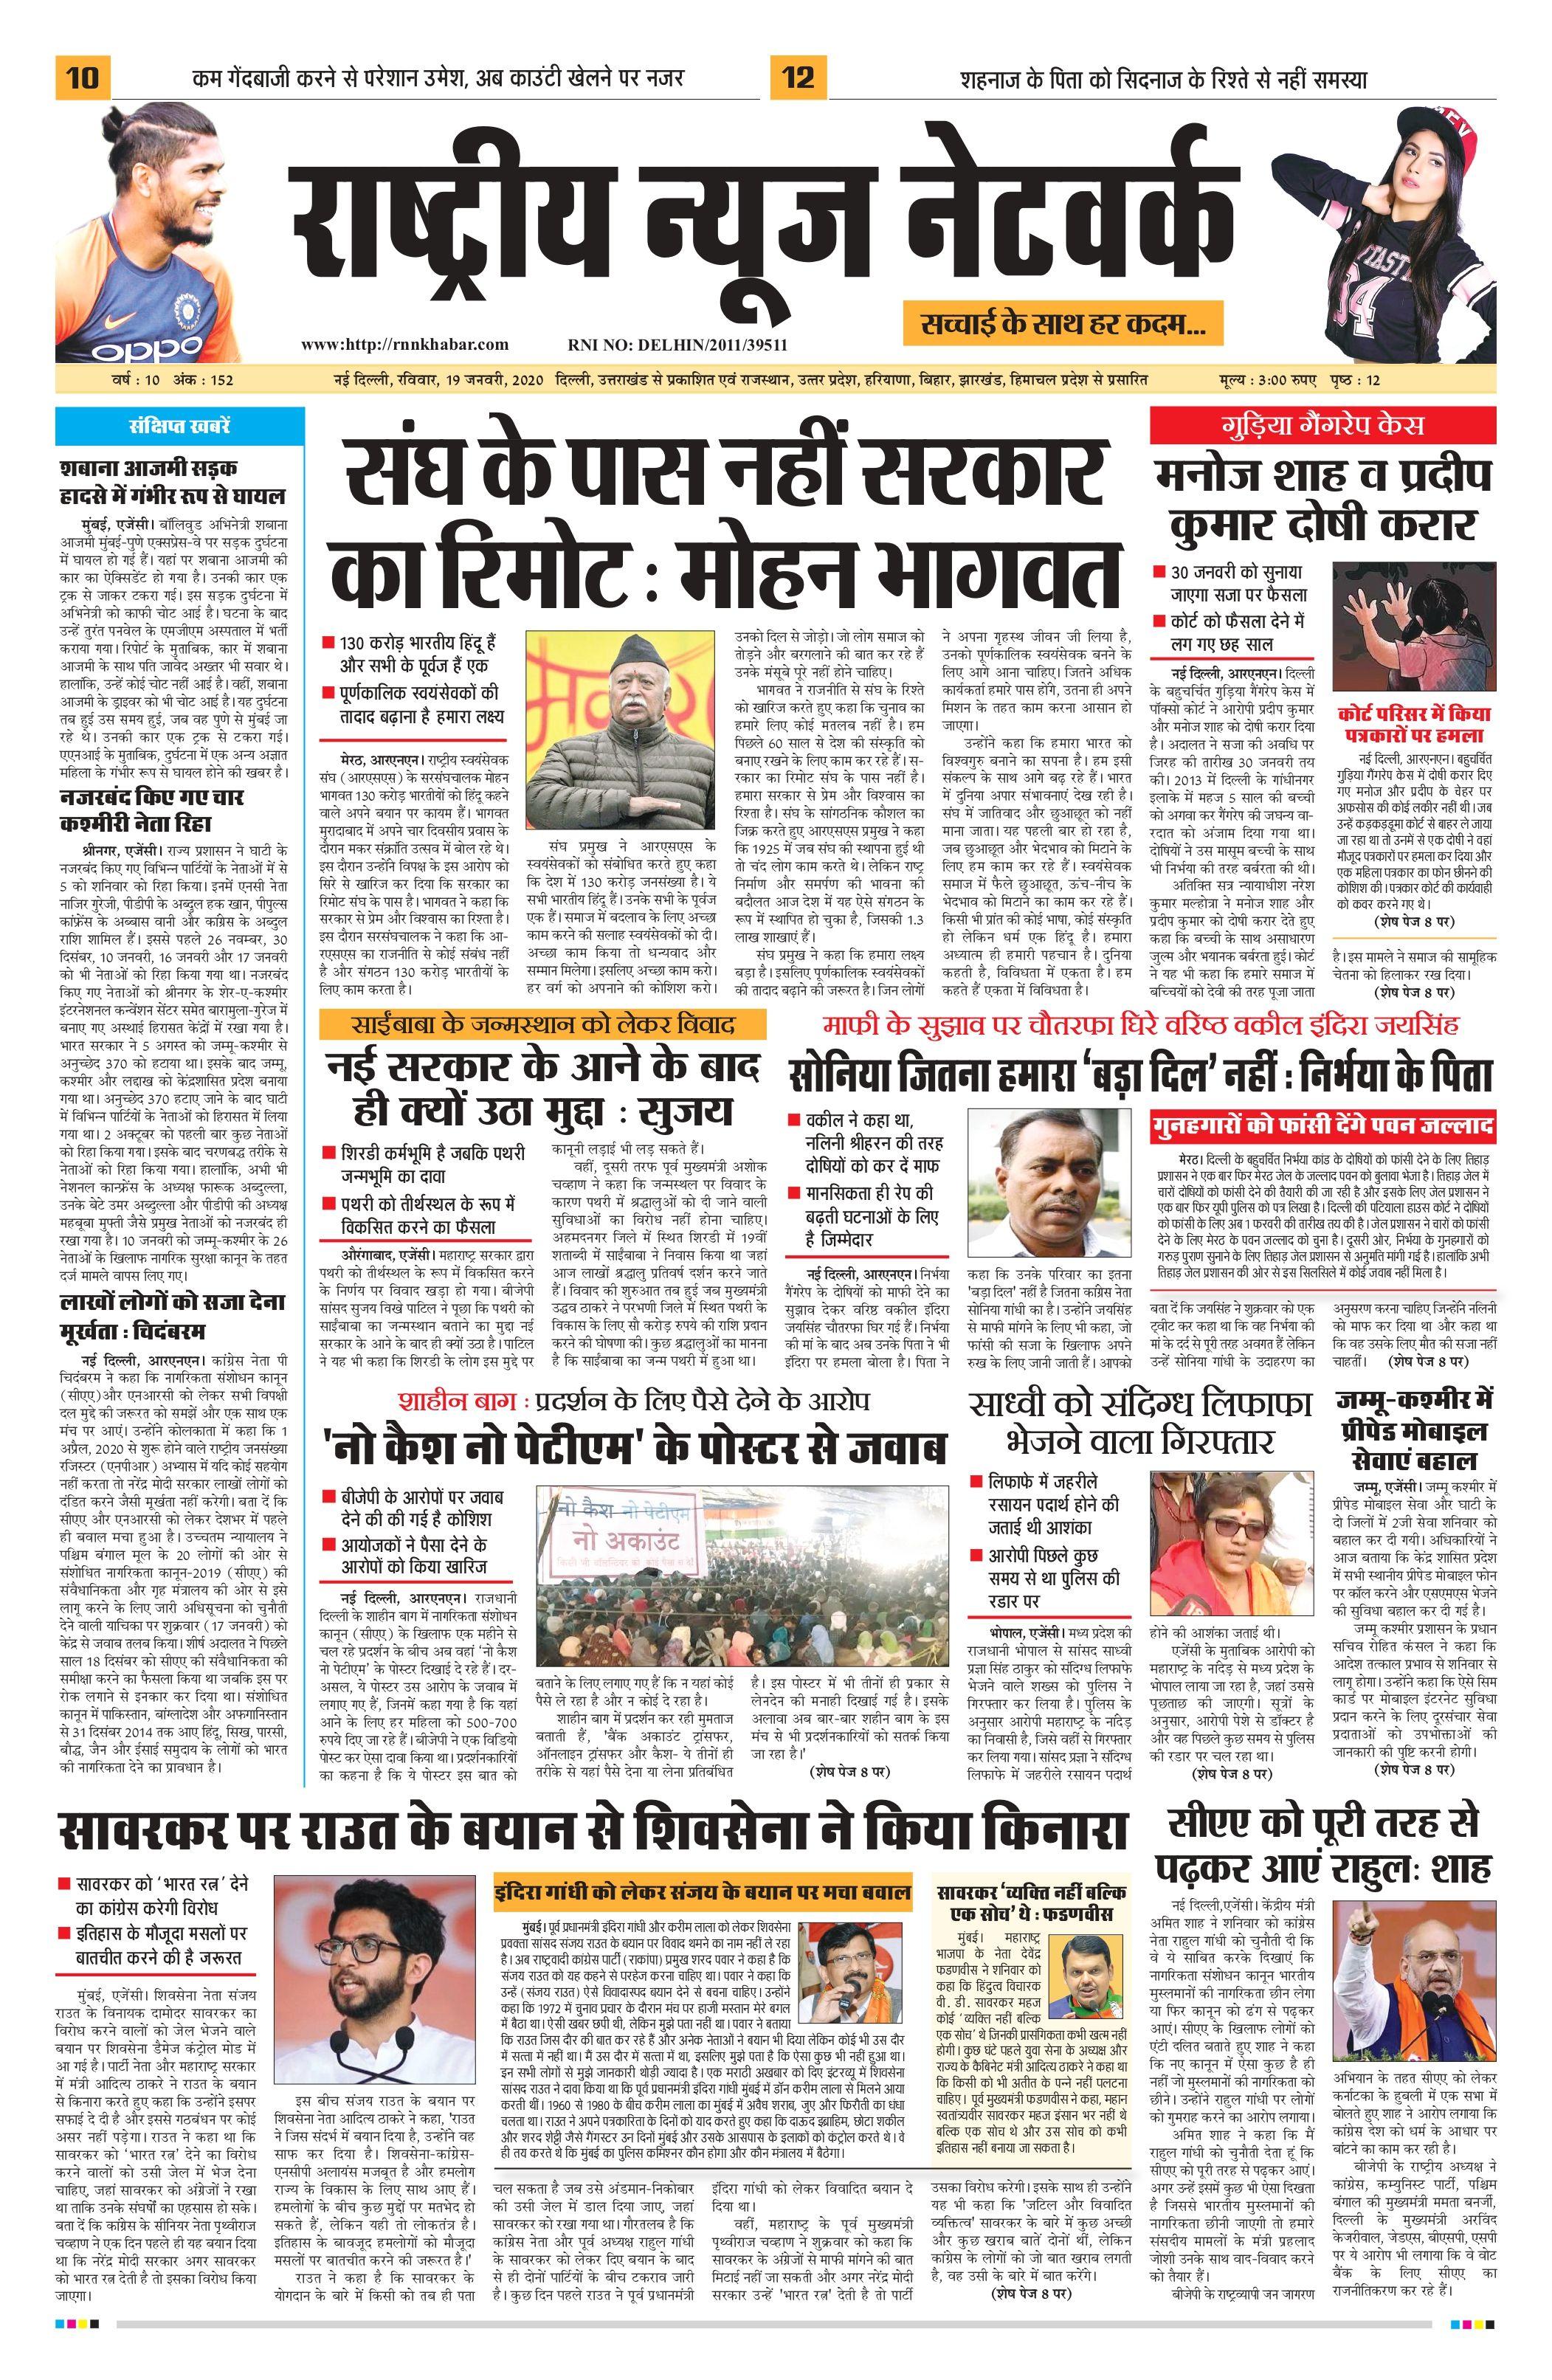 Rashtriya News Network Hindi Khabar News Portal Updated Latest